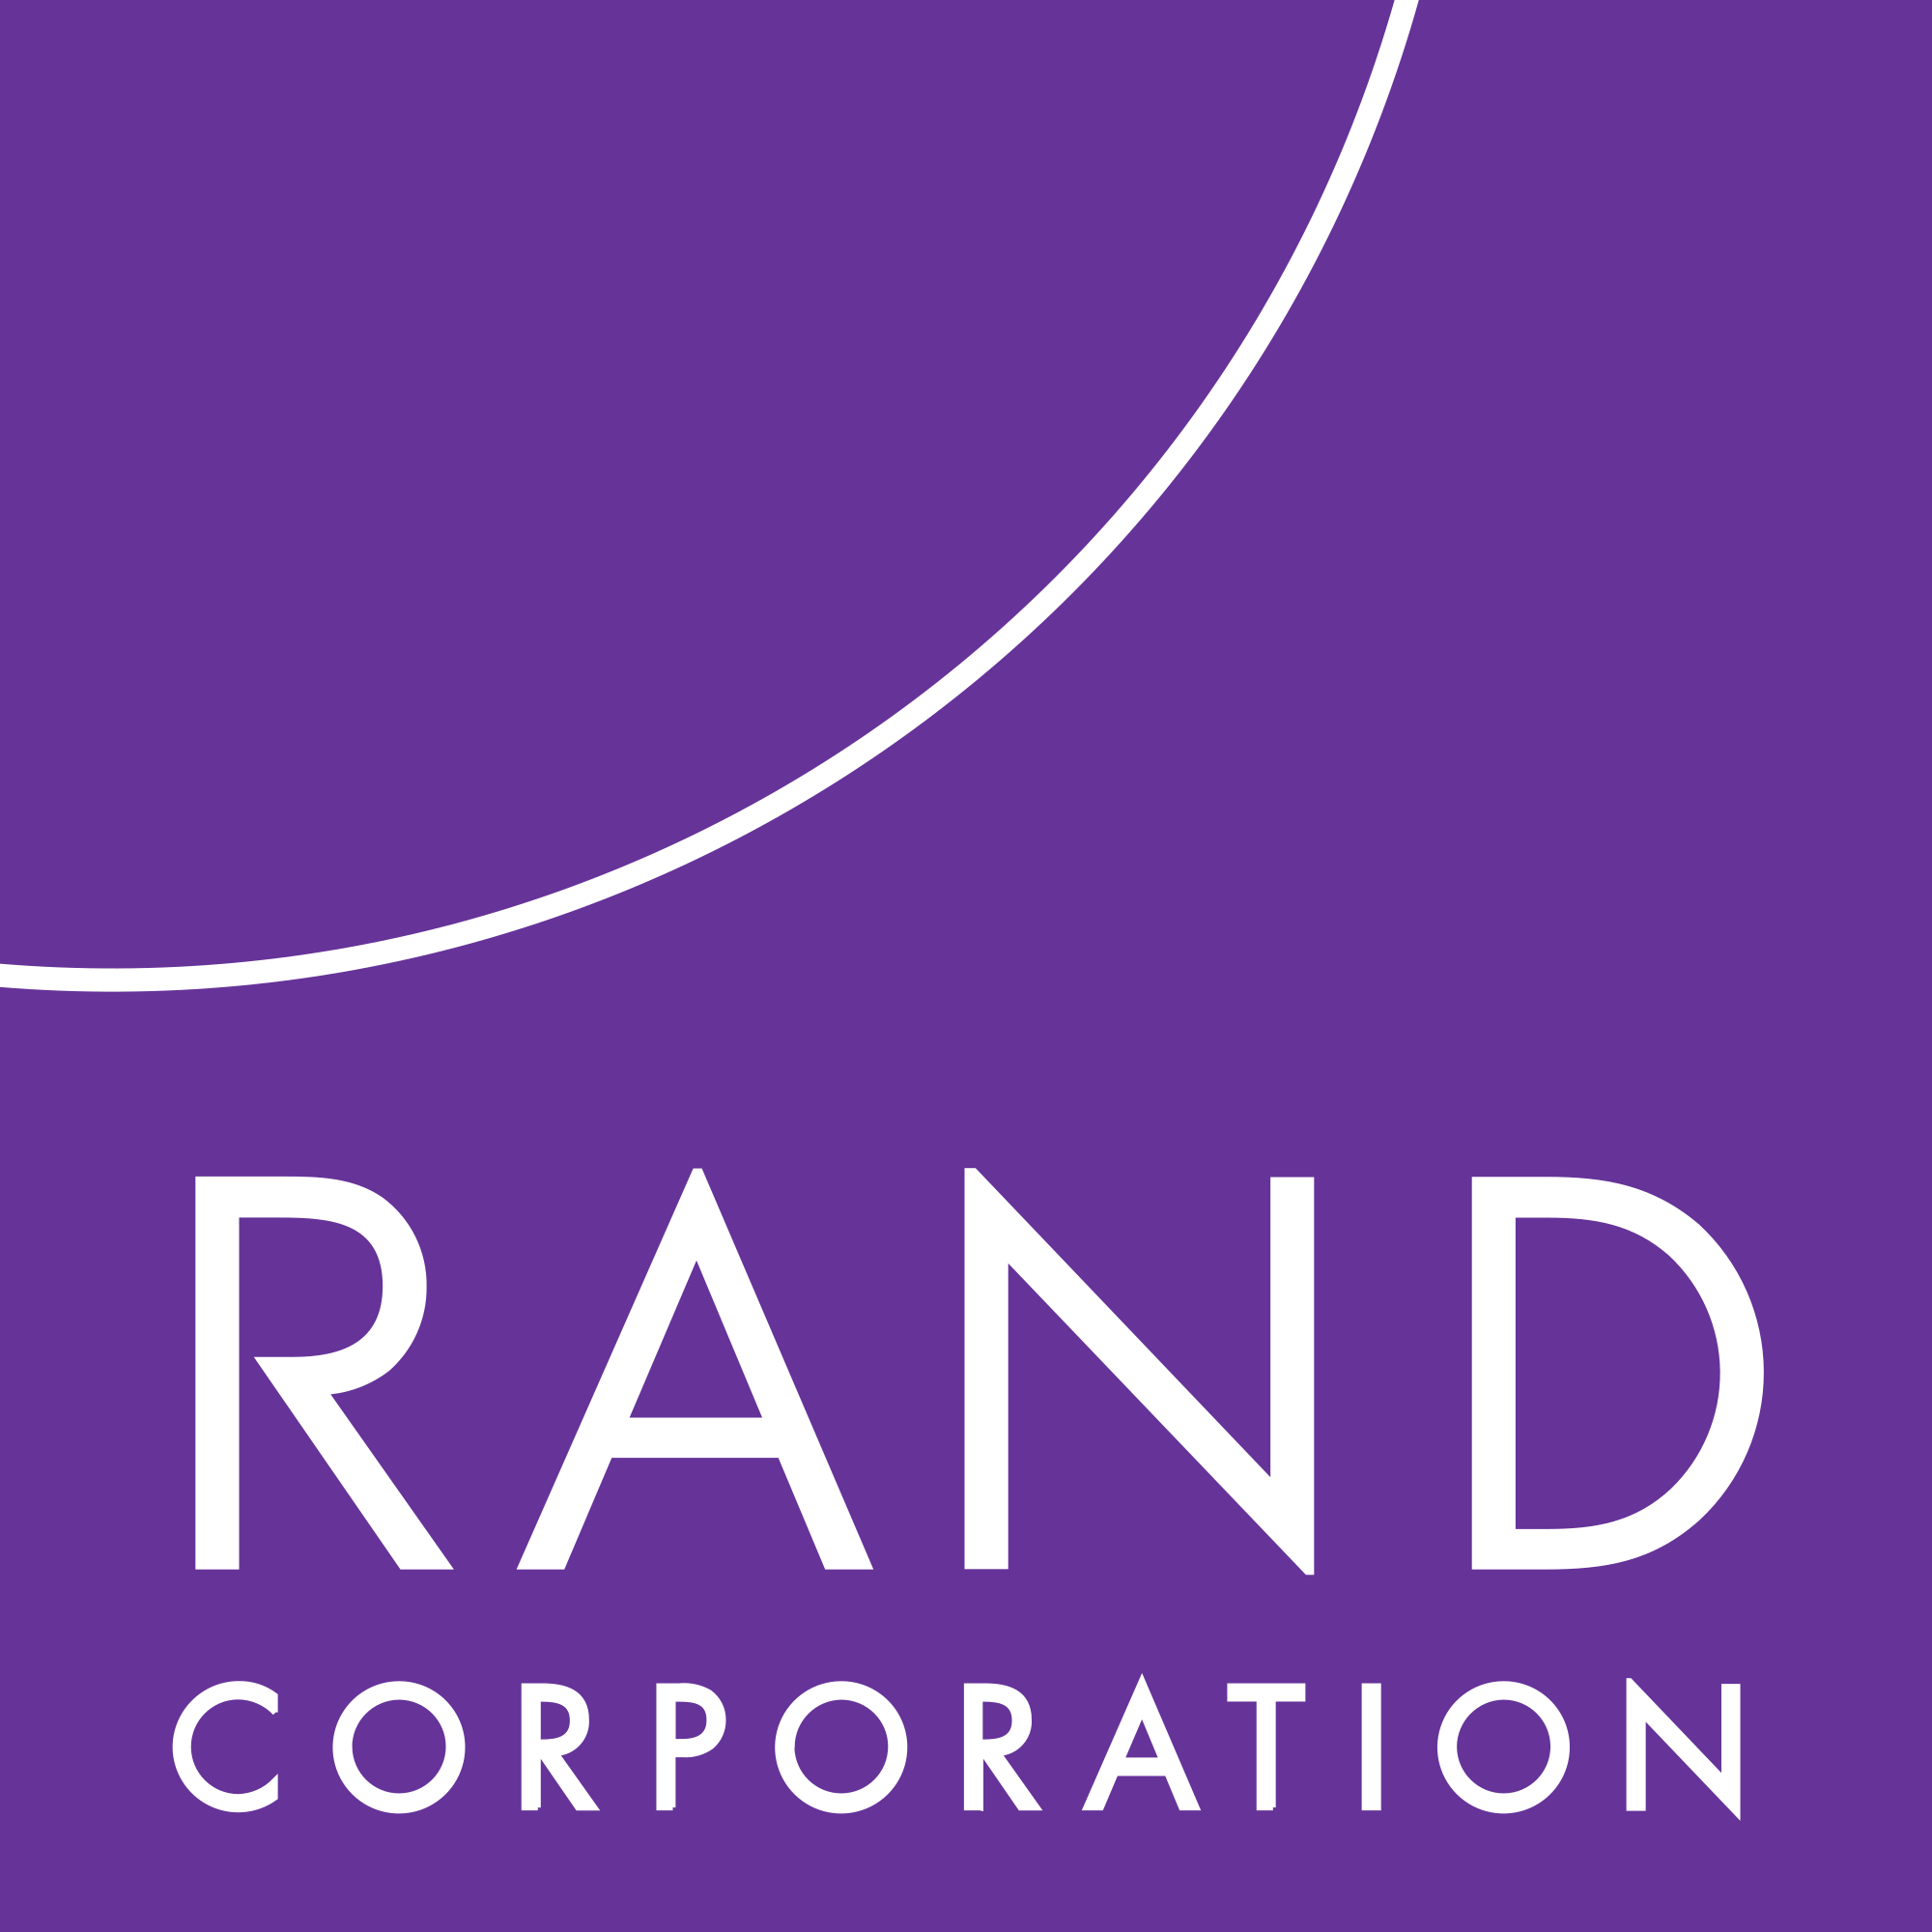 Rand_Corporation_logo.png